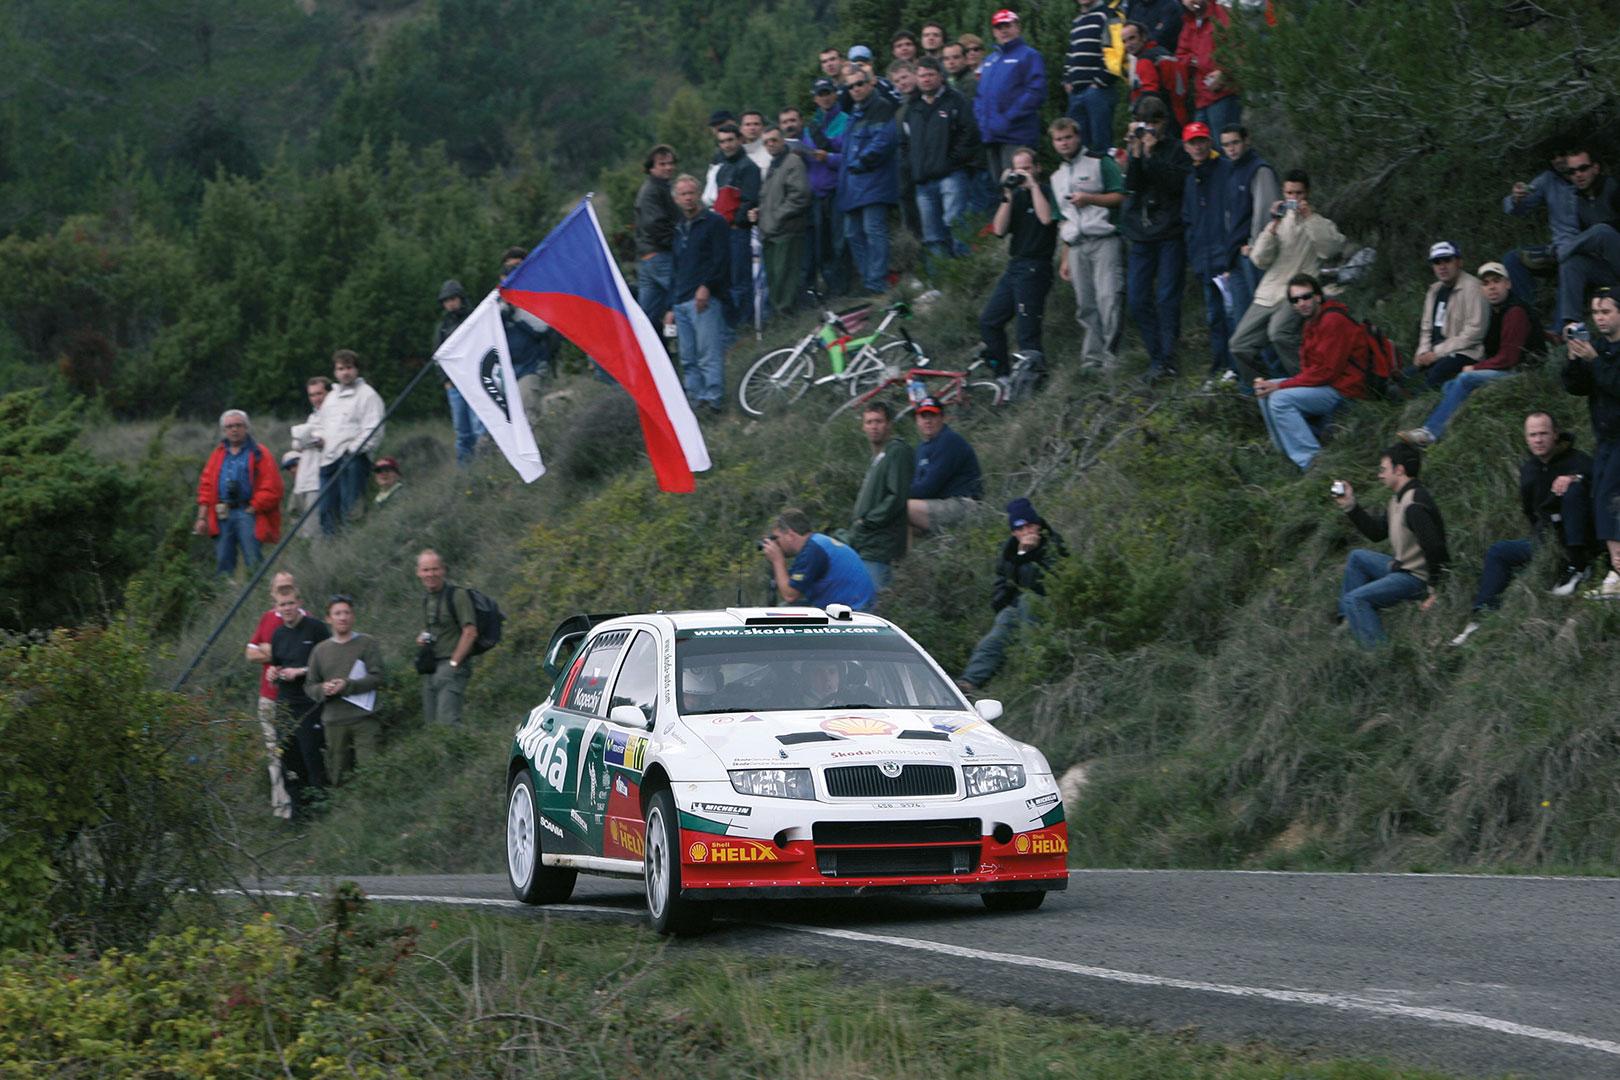 Jan Kopecký / Filip Schovánek, ŠKODA FABIA WRC, ŠKODA Motorsport. RallyRACC Catalunya - Costa Daurada 2005